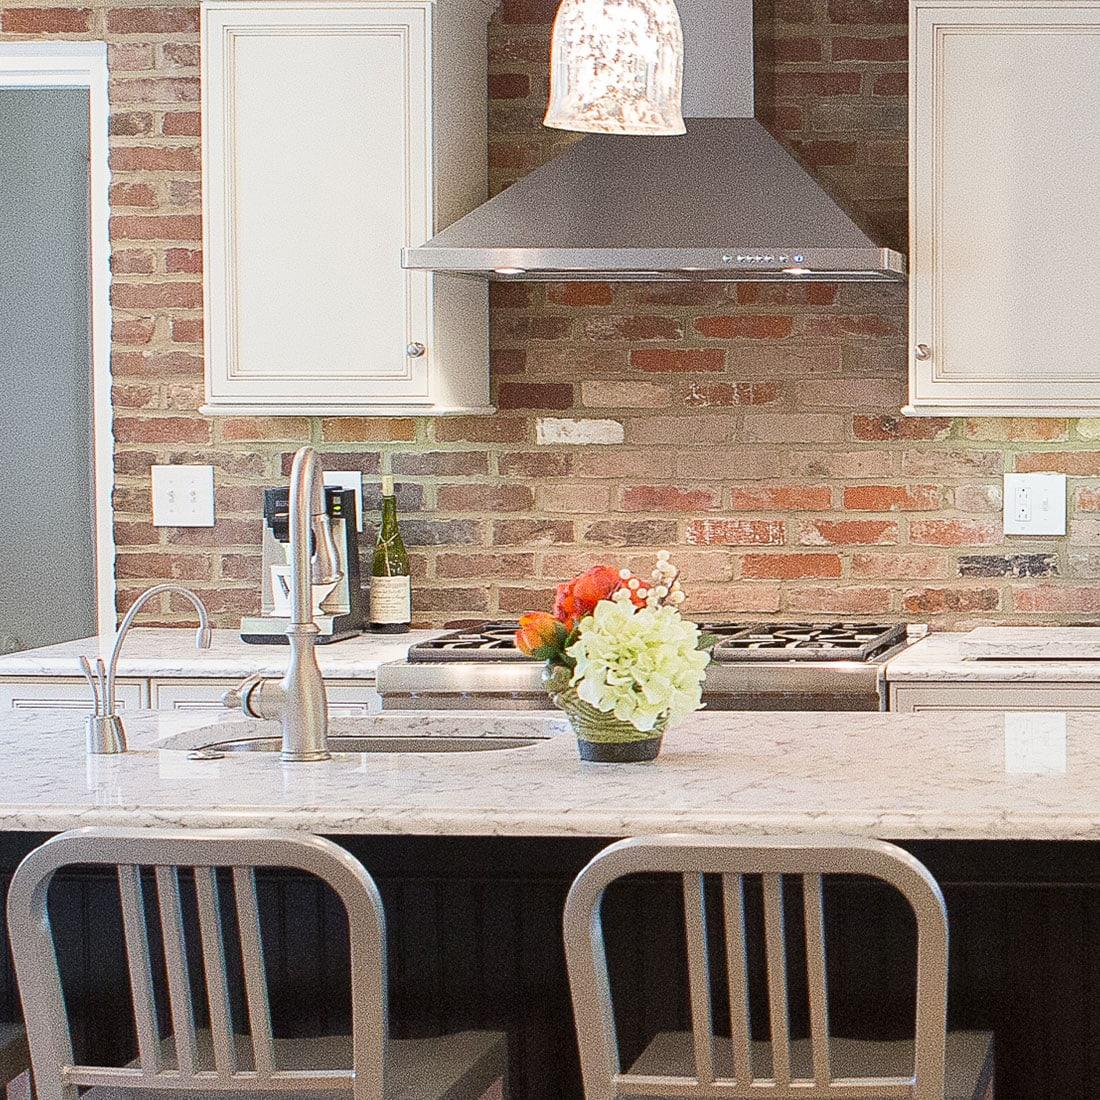 modern range with minimal back against brick backsplash in renovated kitchen